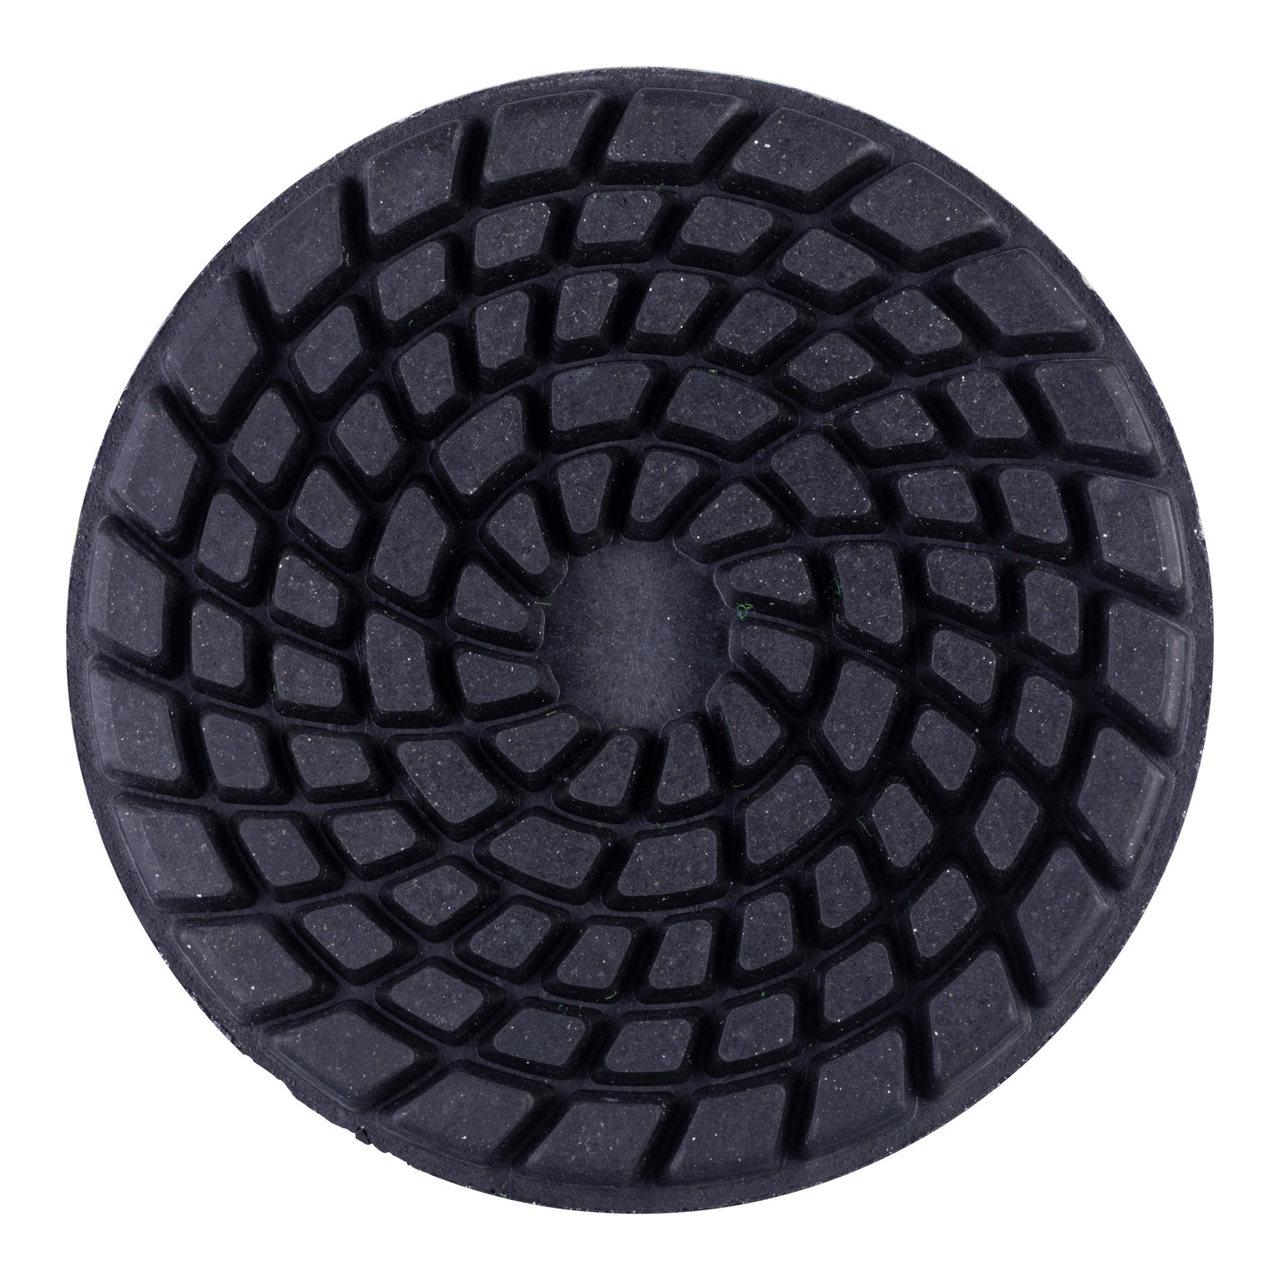 Lixa diamantada para concreto 100mm-6mm